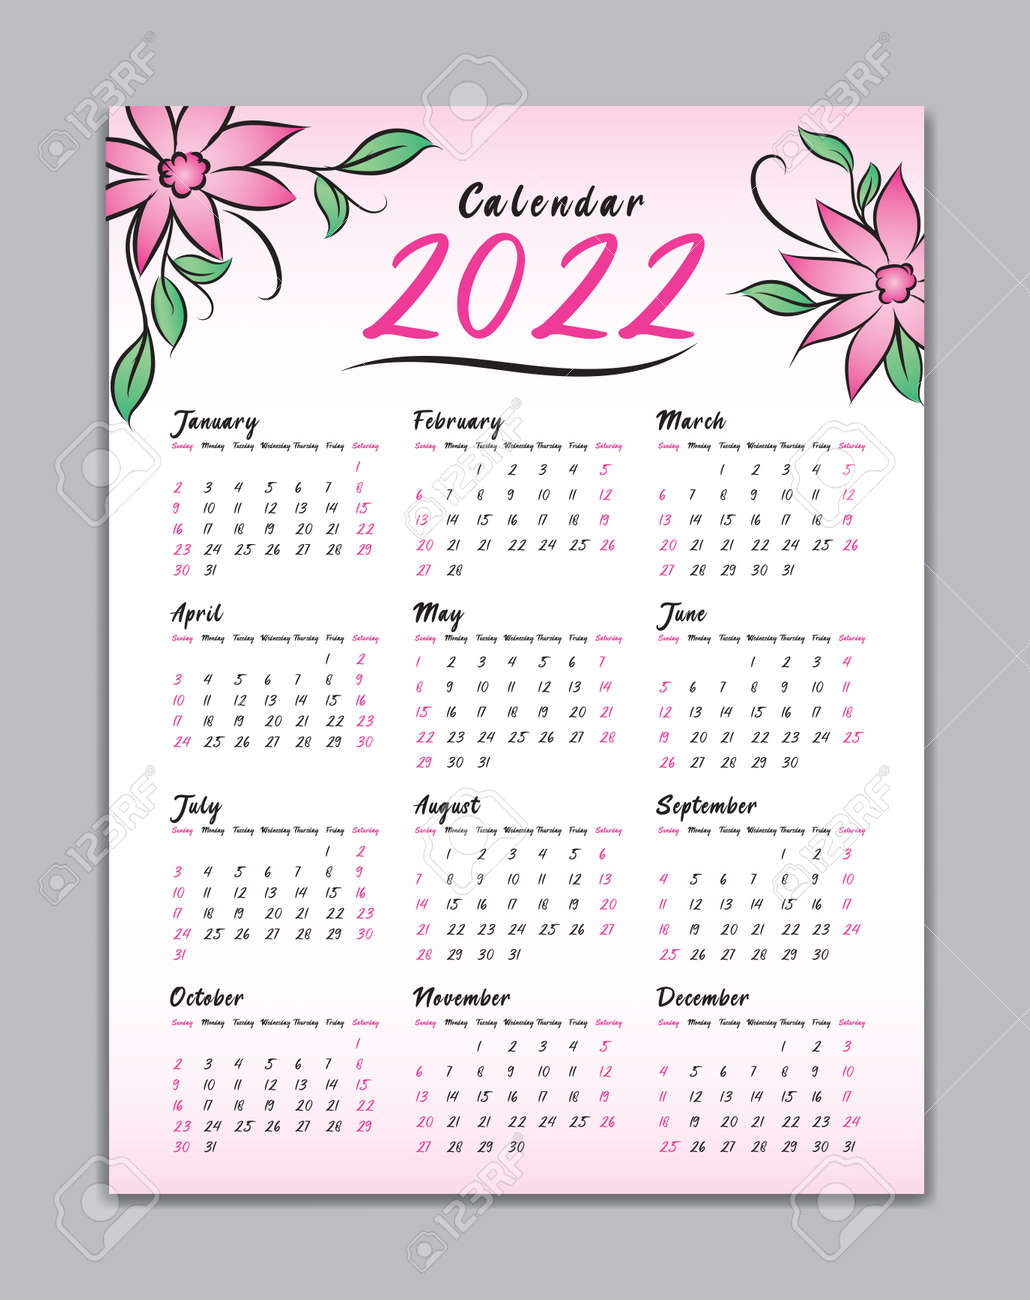 Wall Calendar 2022.Calendar 2022 Vector Template Wall Calendar 2022 Simple Minimal Royalty Free Cliparts Vectors And Stock Illustration Image 147403220